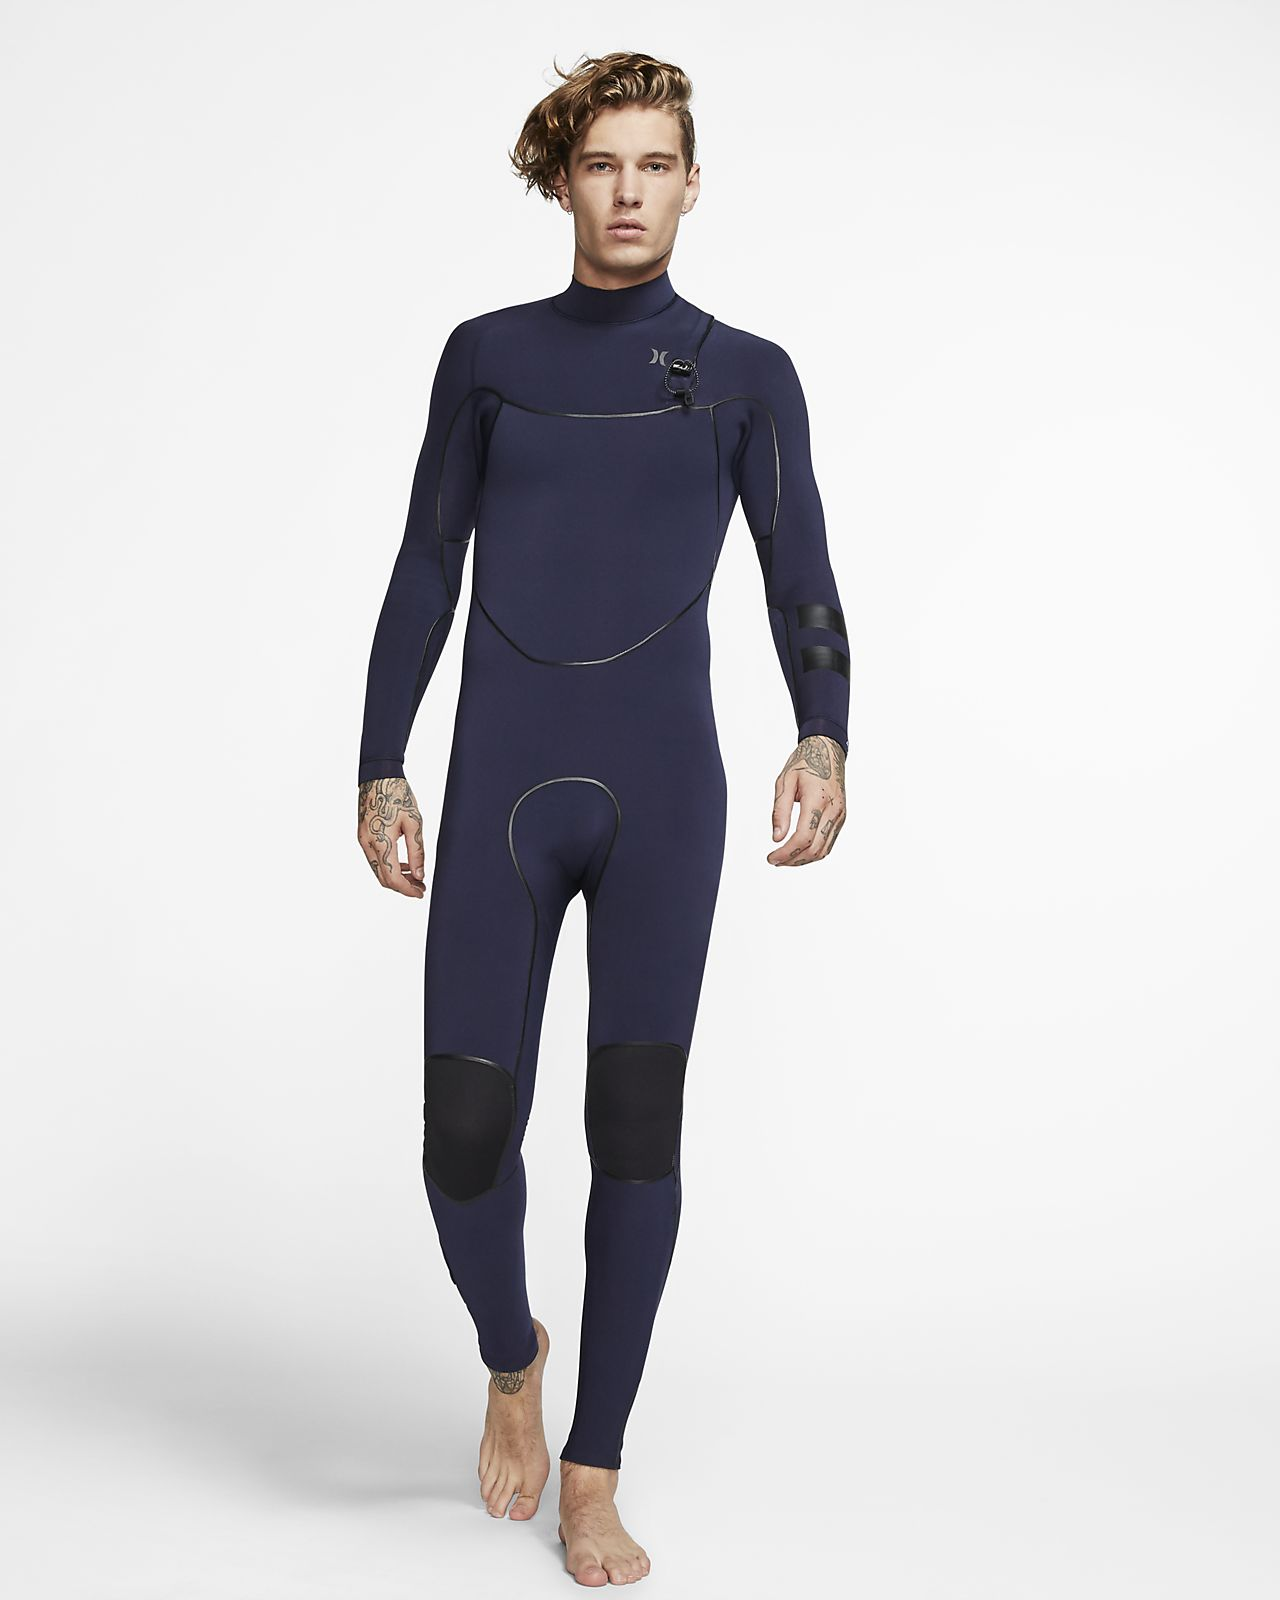 Pánský neoprenový oblek Hurley Advantage Max 3/2mm Fullsuit